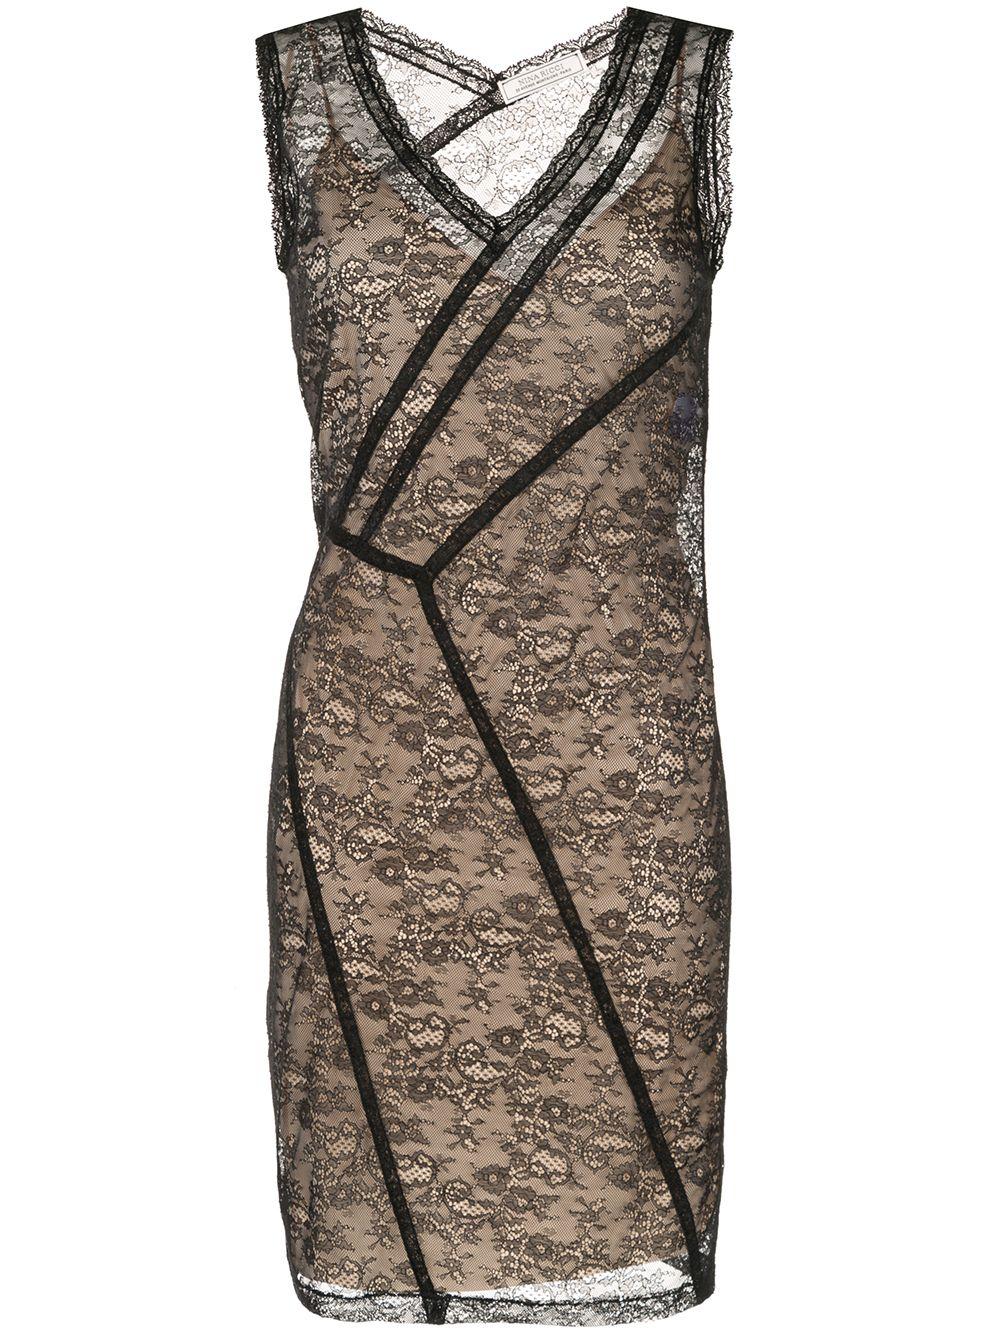 NINA RICCI | кружевное платье миди | Clouty